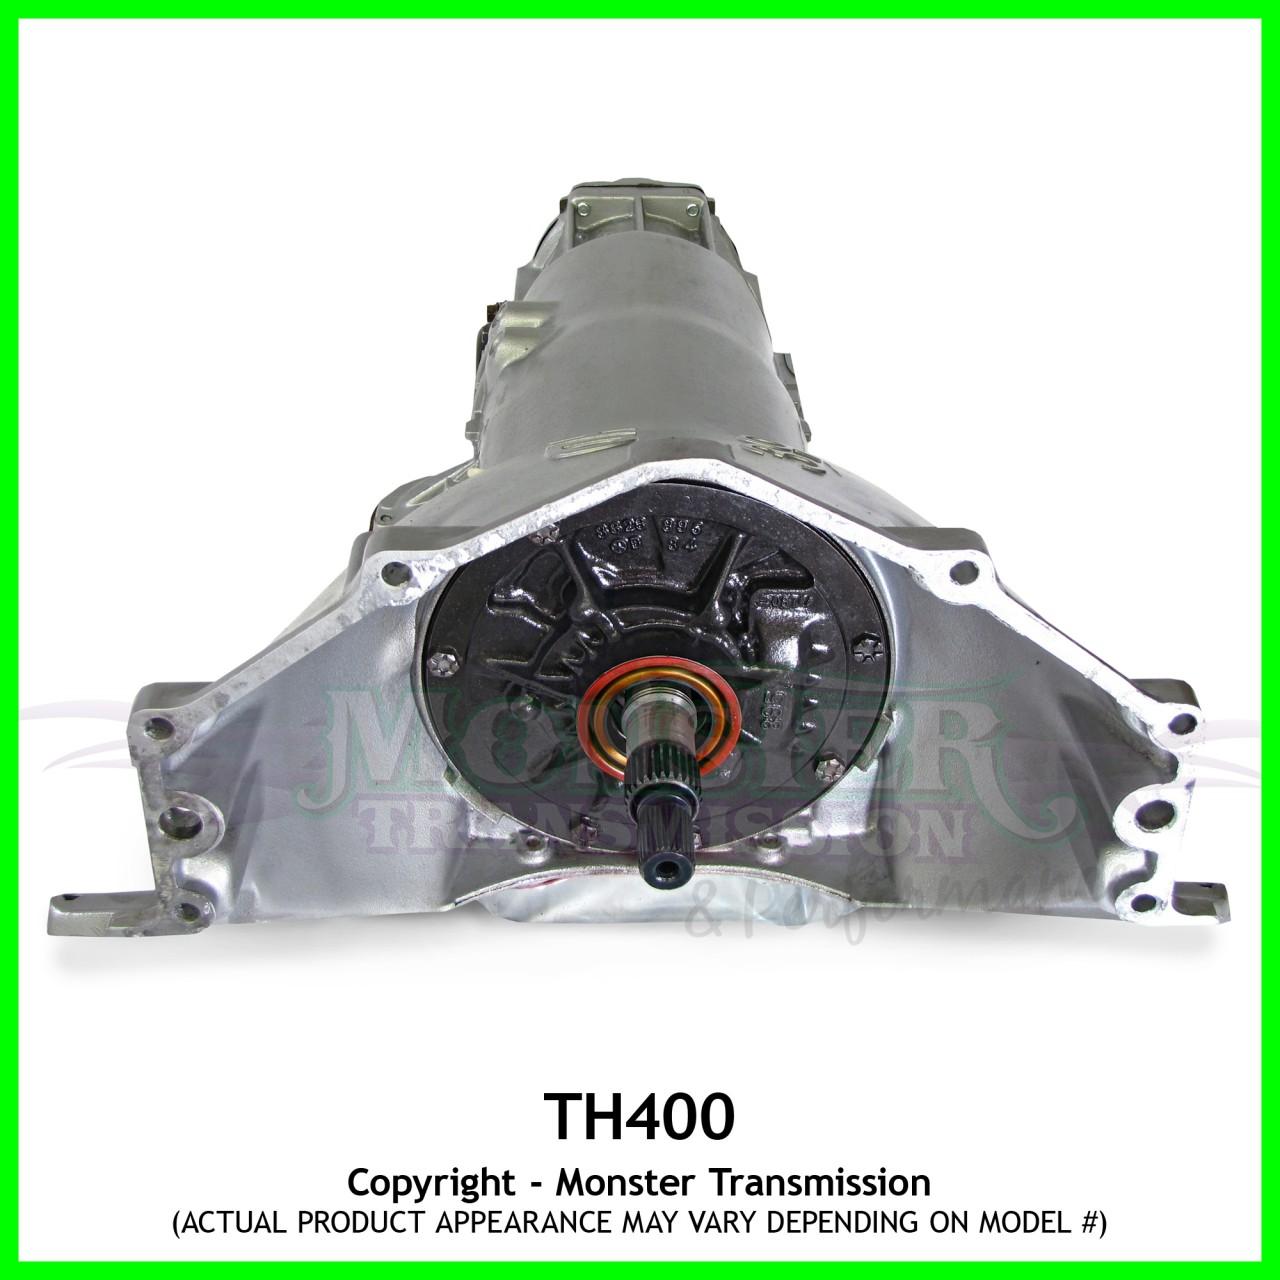 Turbo 400 TH400 Transmission Heavy Duty Performance 4\